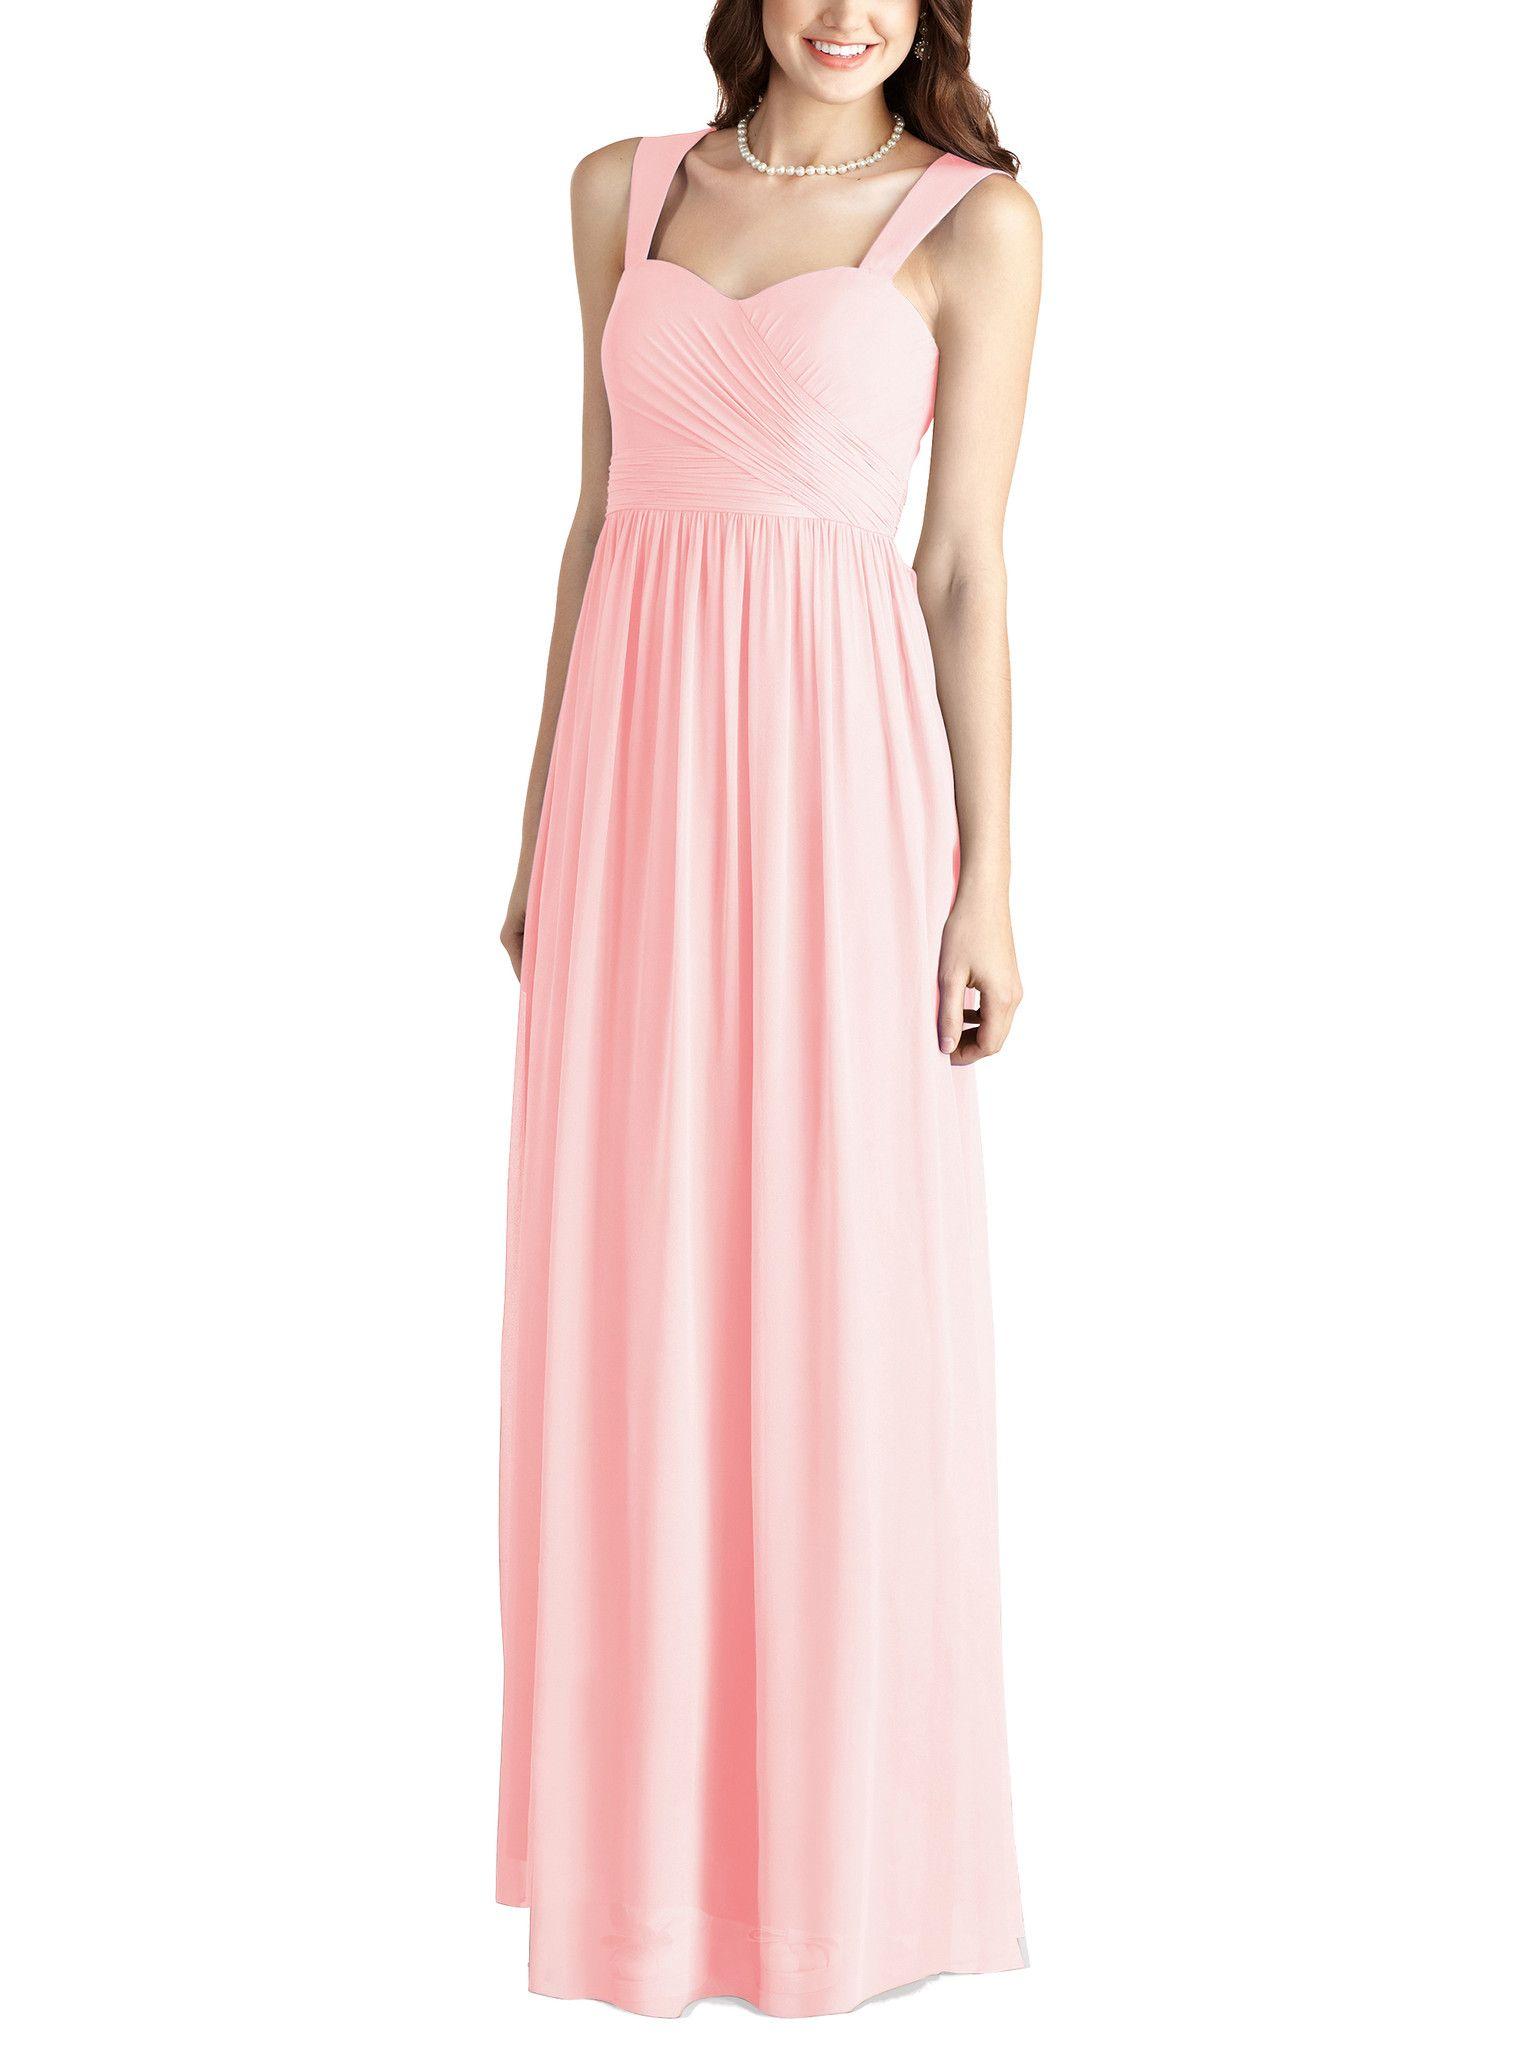 Donna Morgan Bailey   Julie\'s bridesmaid dresses   Pinterest